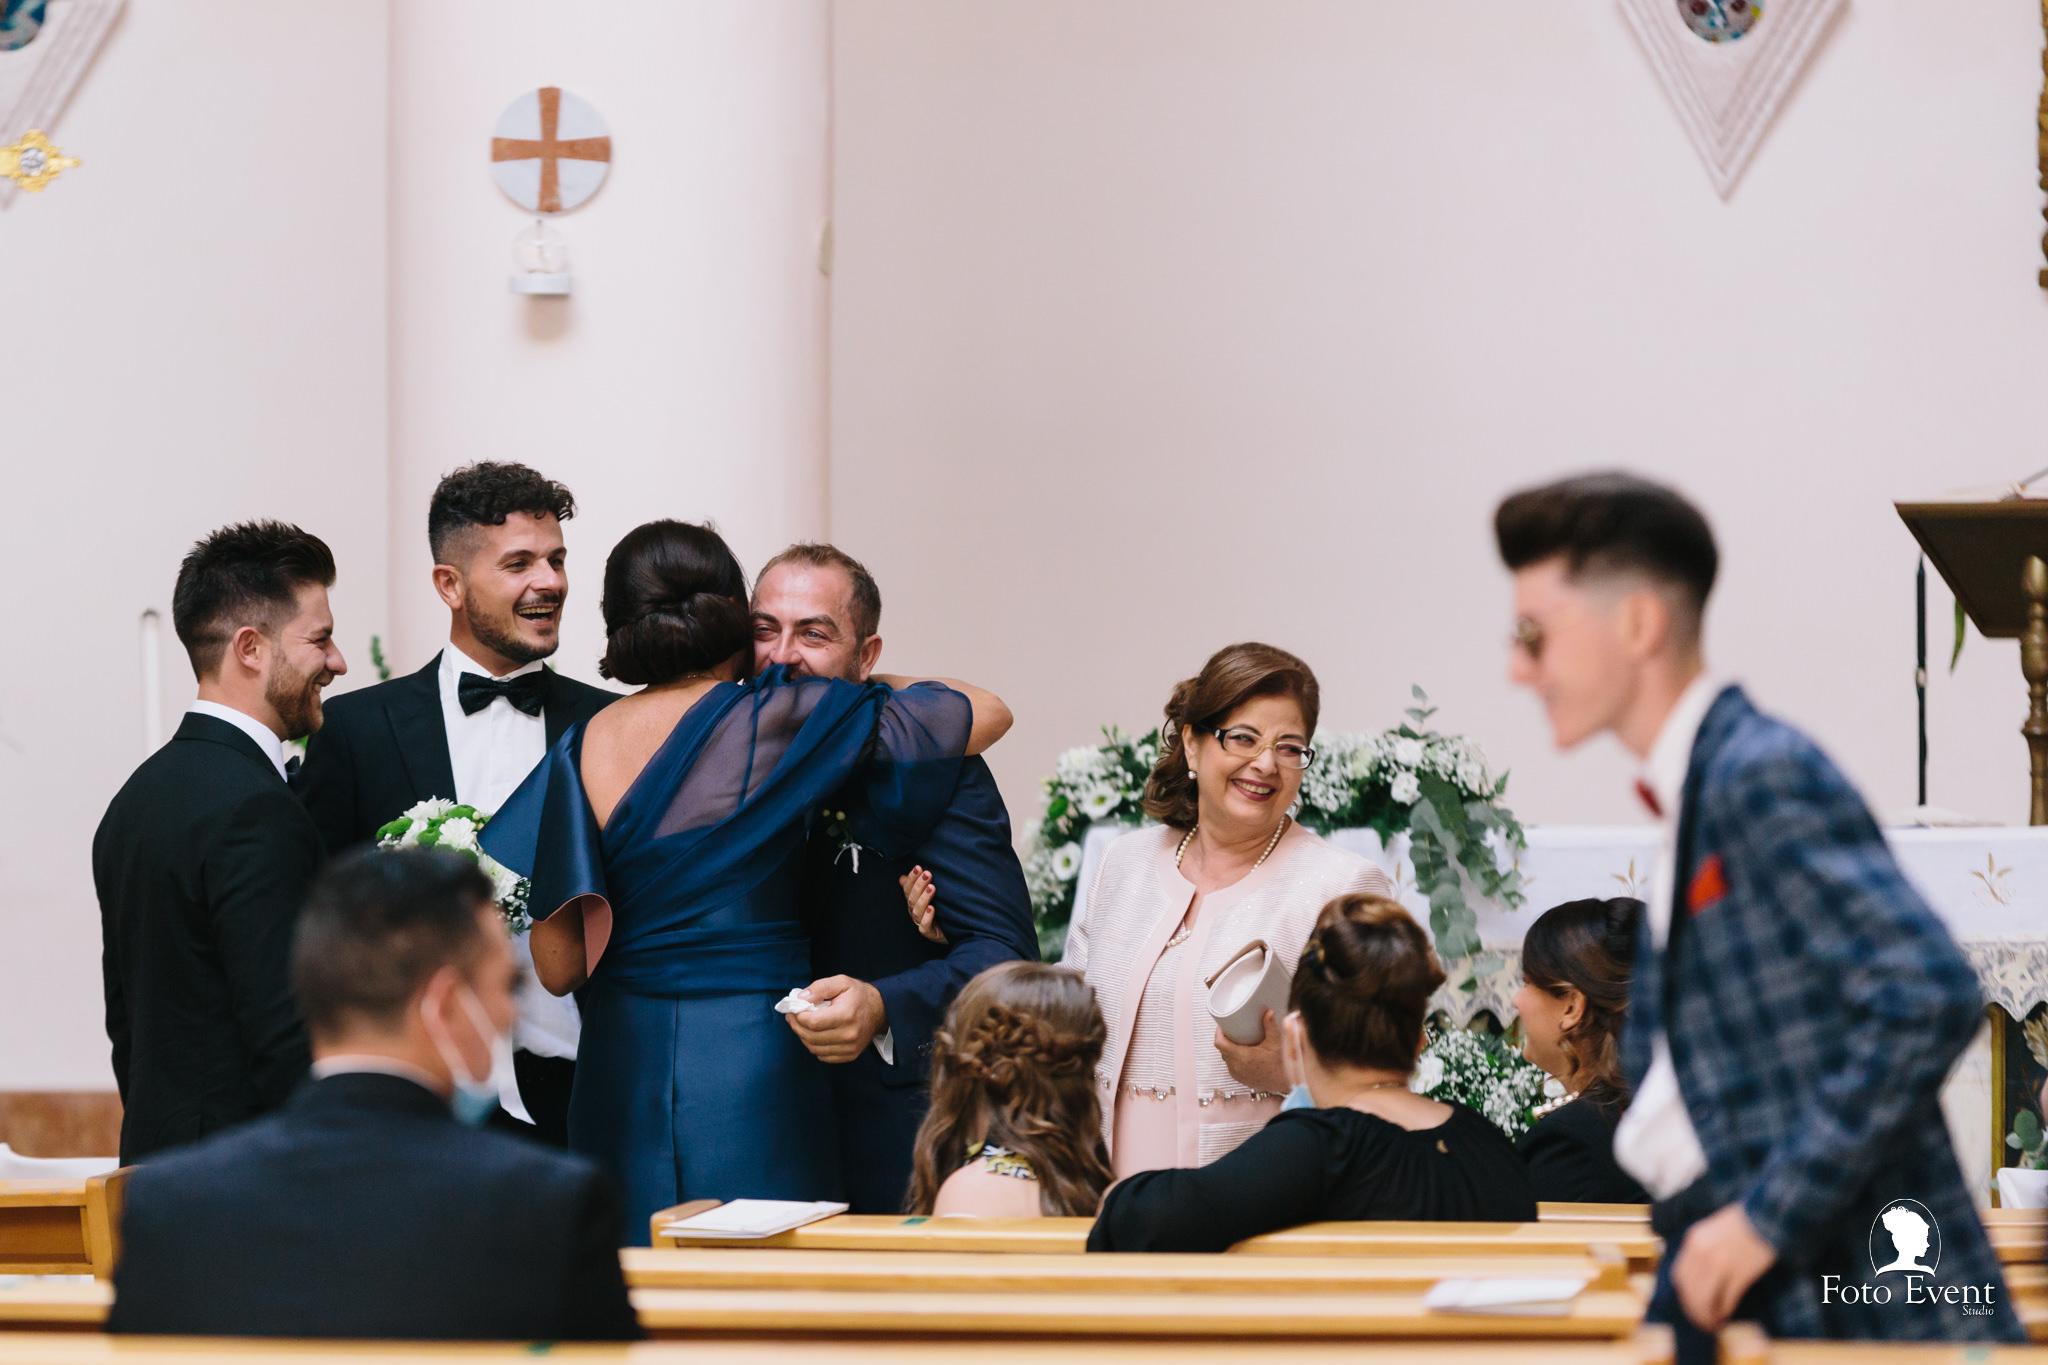 035-2020-10-15-Matrimonio-Noemi-e-Salvatore-Paterno-zoom-386